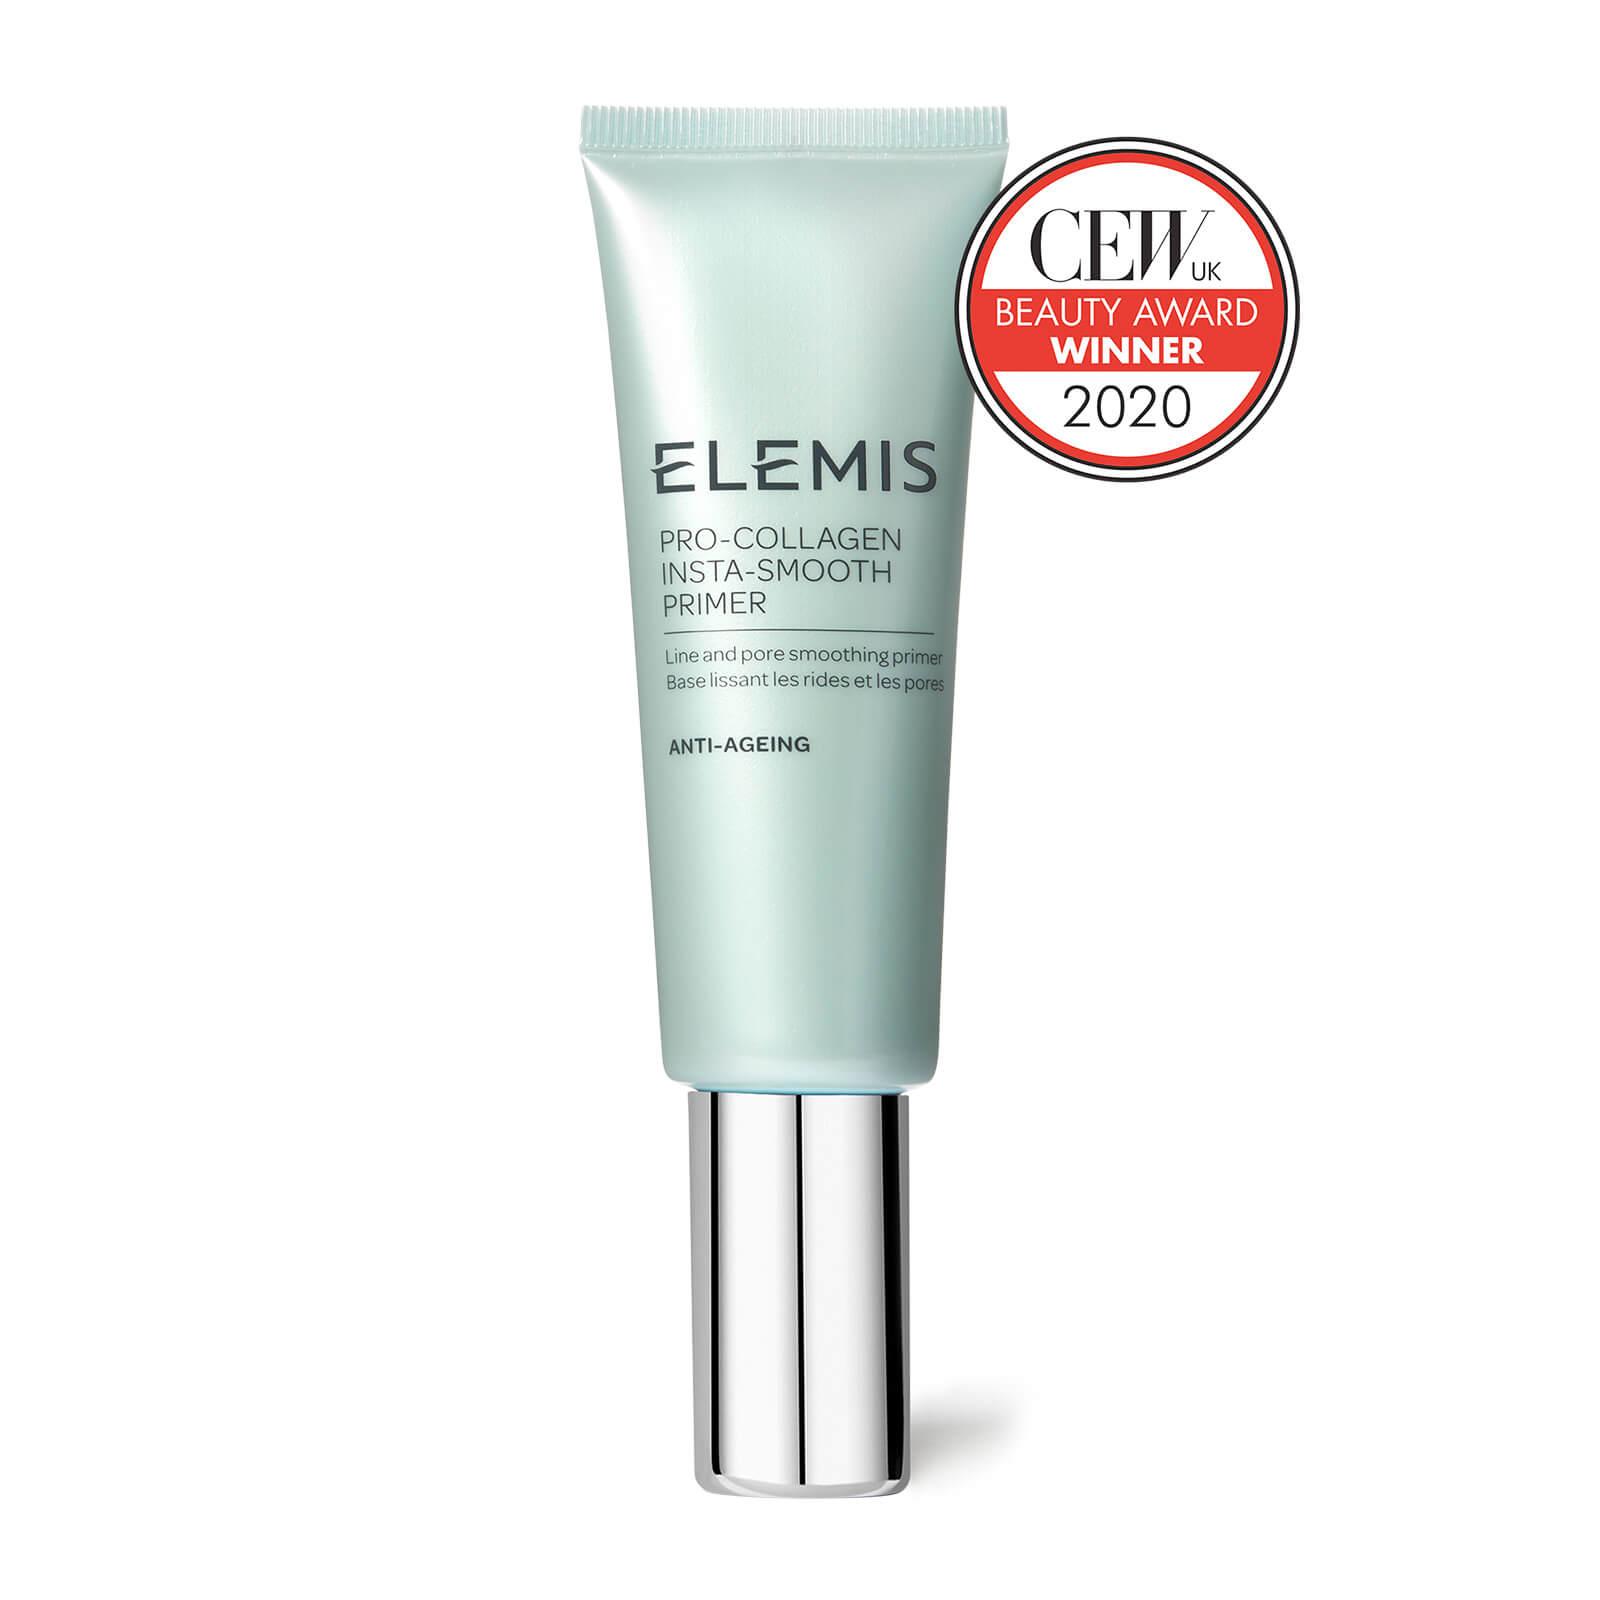 Купить Elemis Pro-Collagen Insta-Smooth Primer 50ml